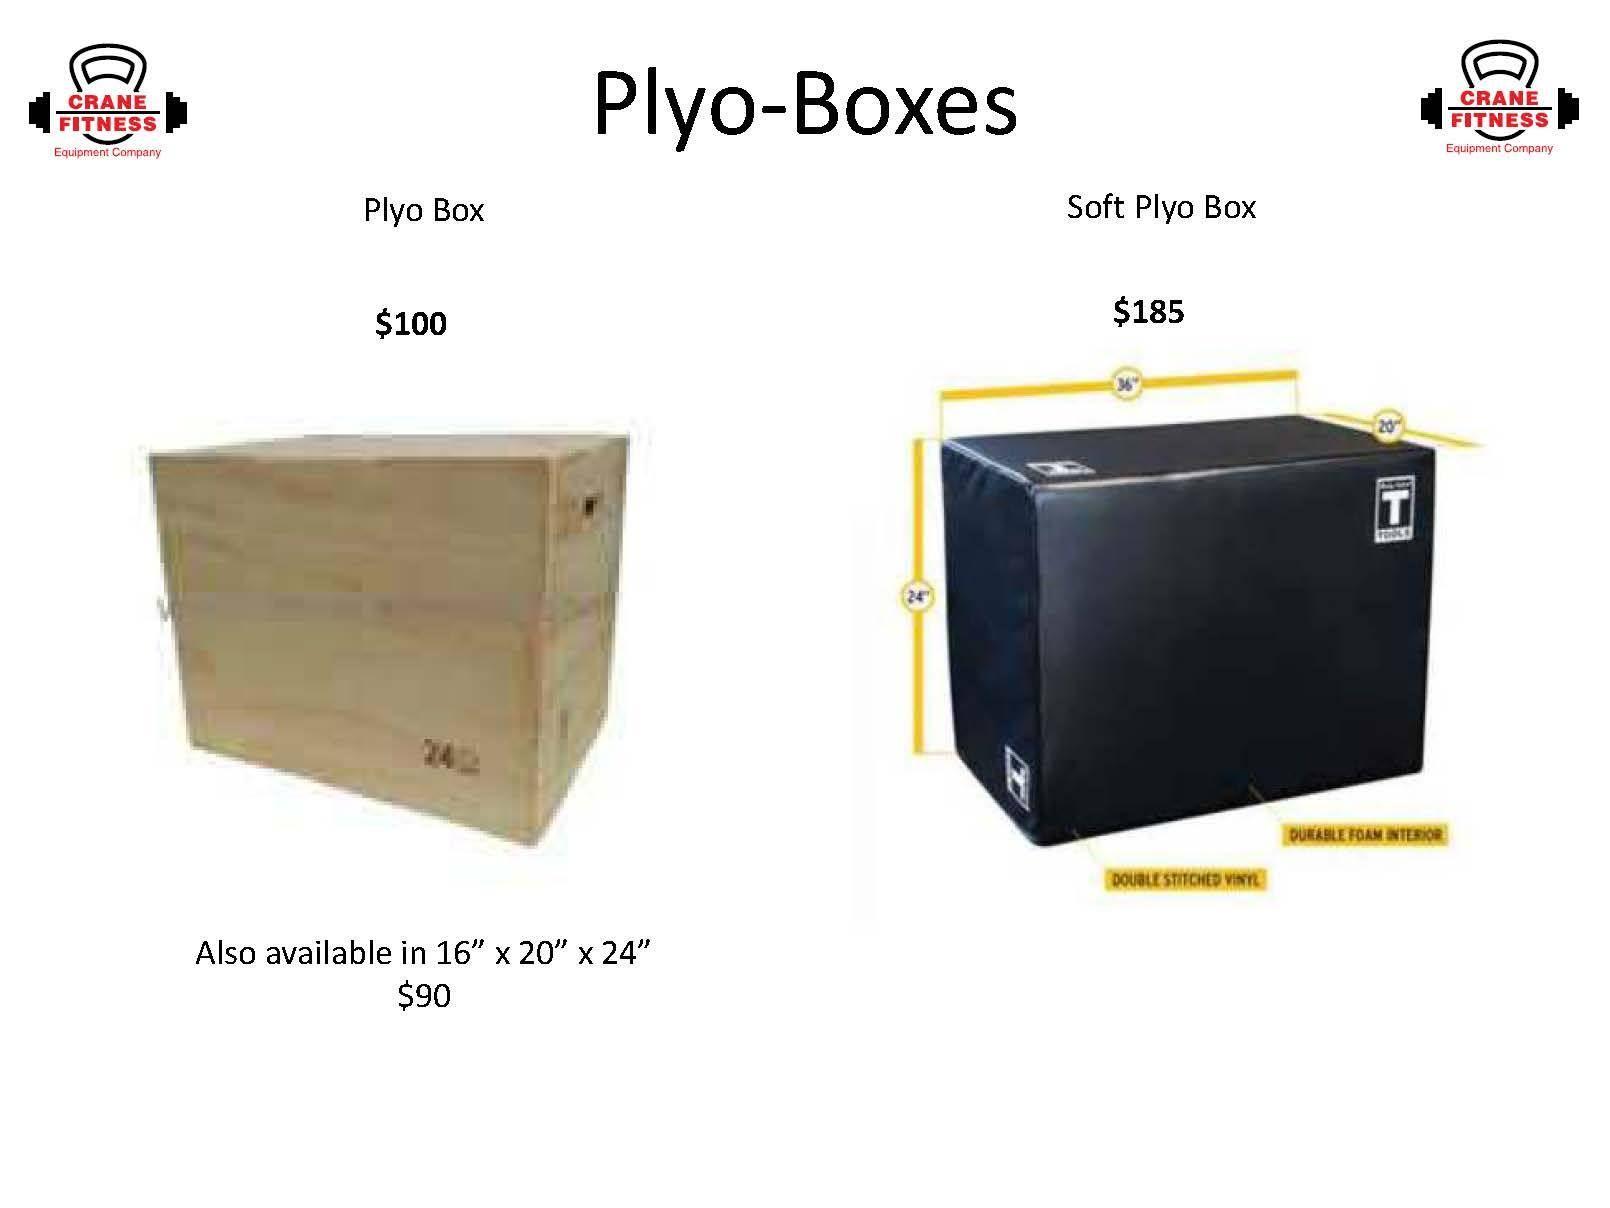 Crane Fitness Plyo Box Home Gym Pinterest Gym